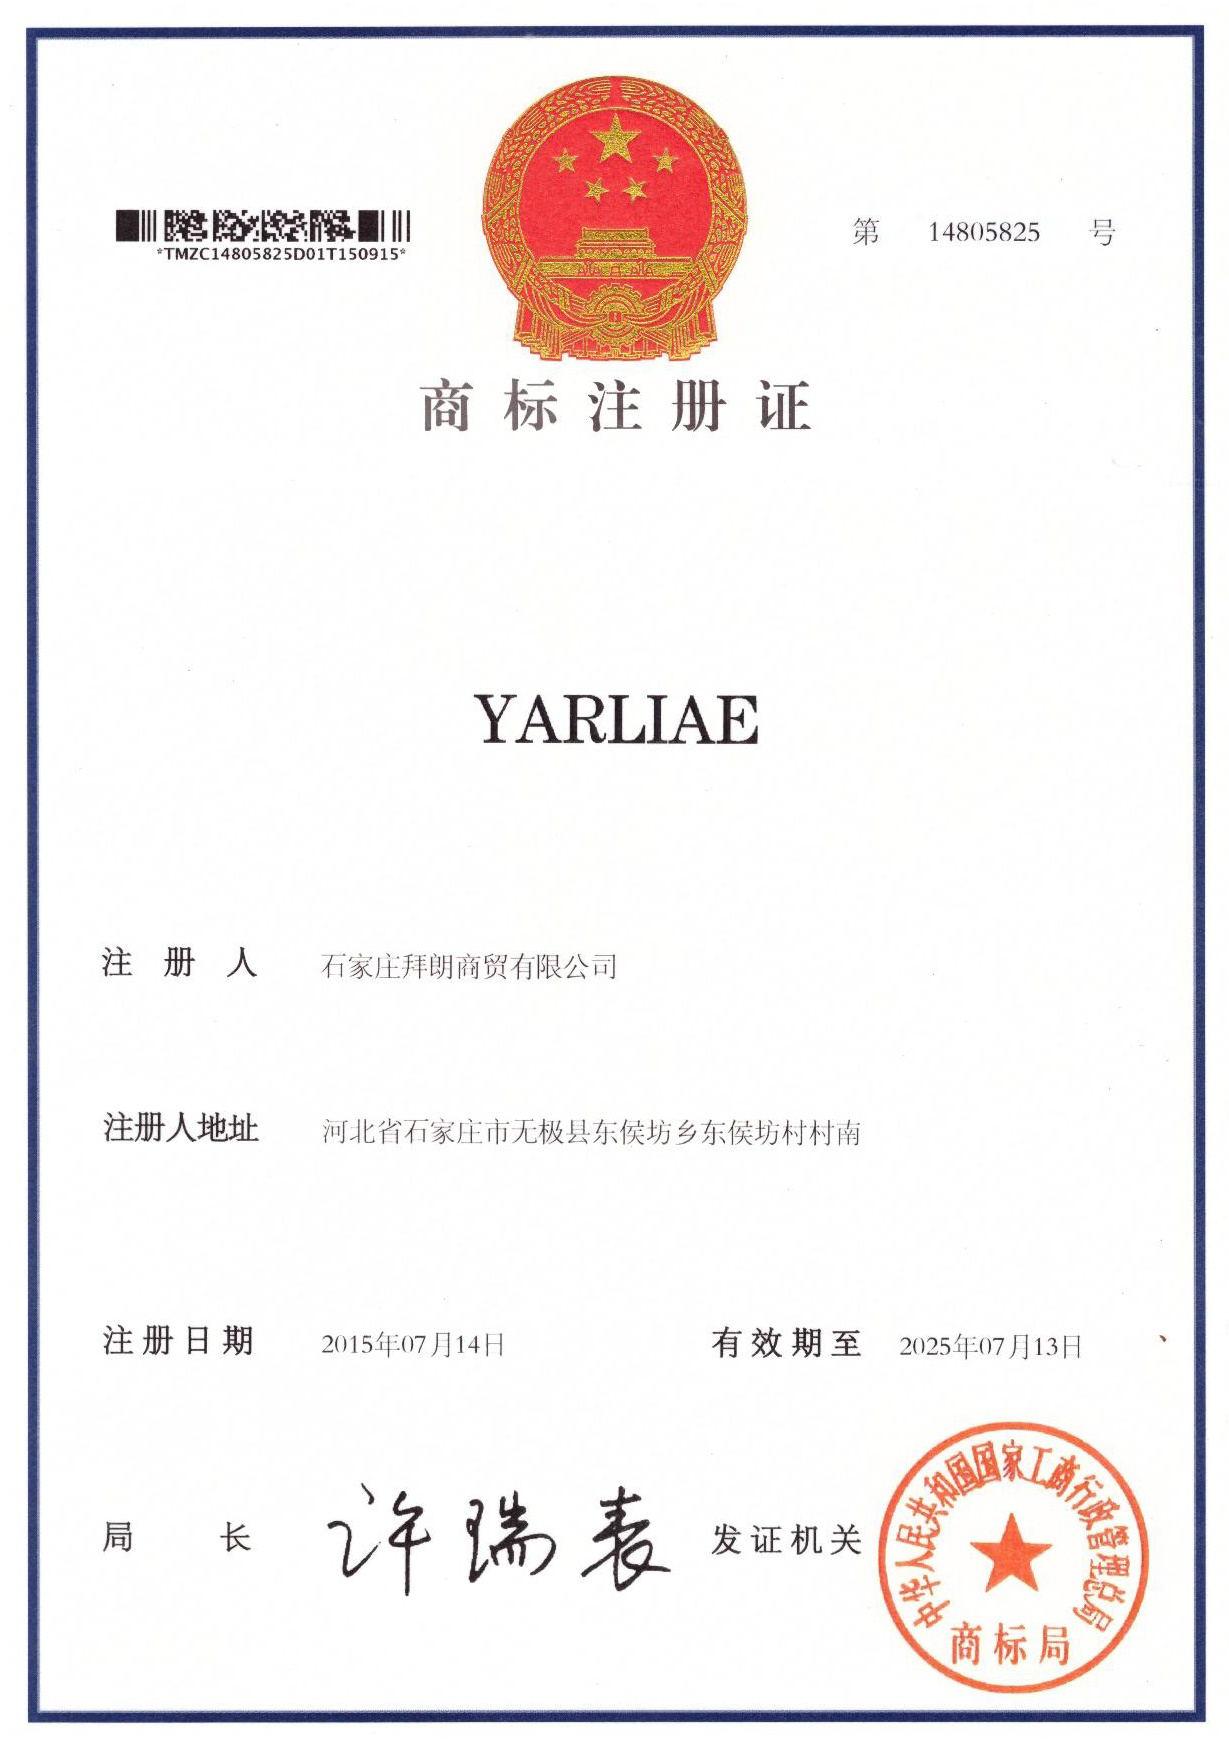 YARLIAE